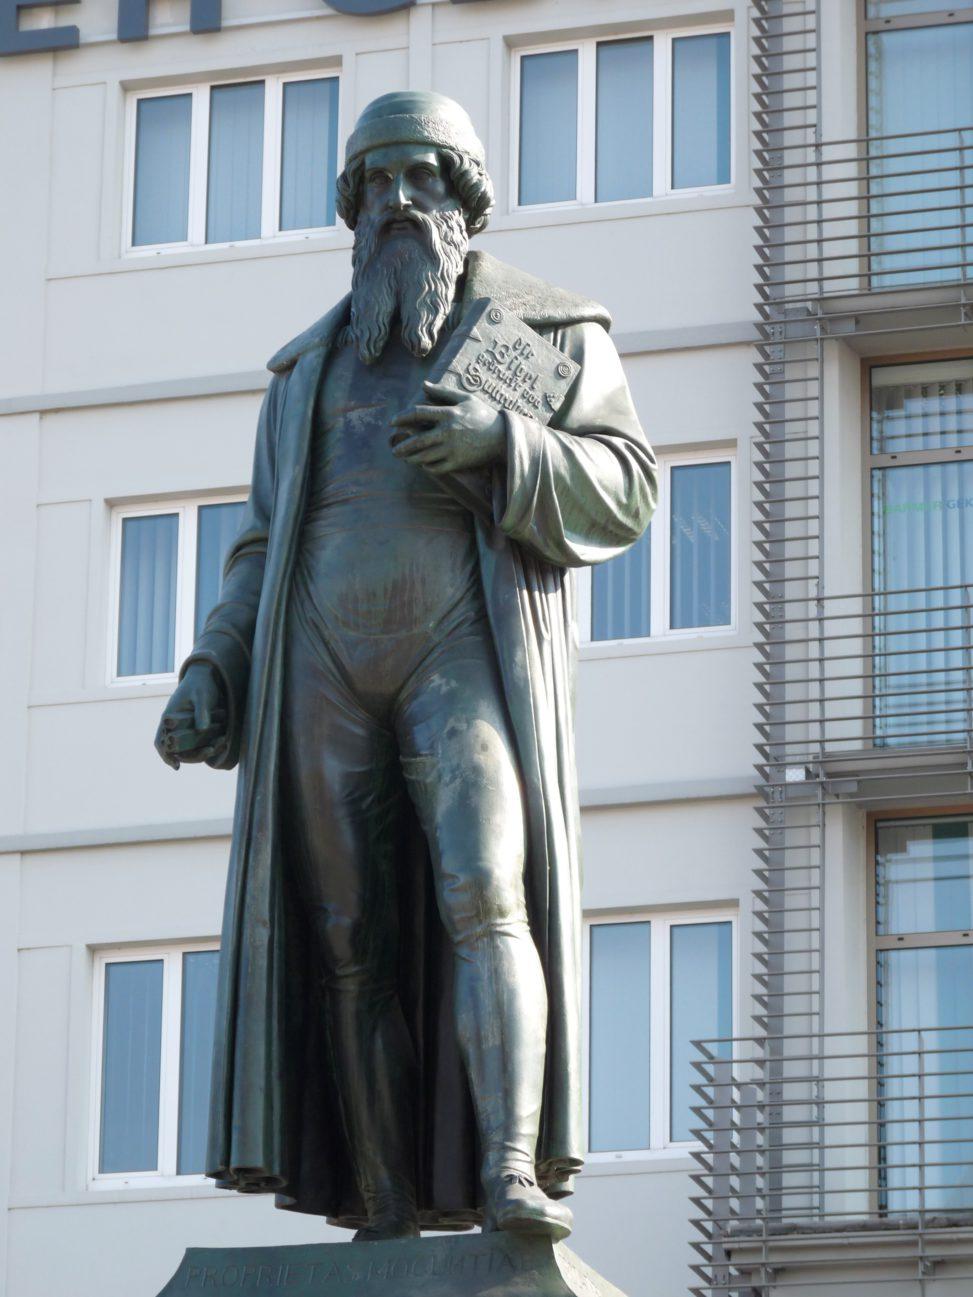 Gutenberg-Denkmal Mainz: Dieter Schütz - pixelio.de